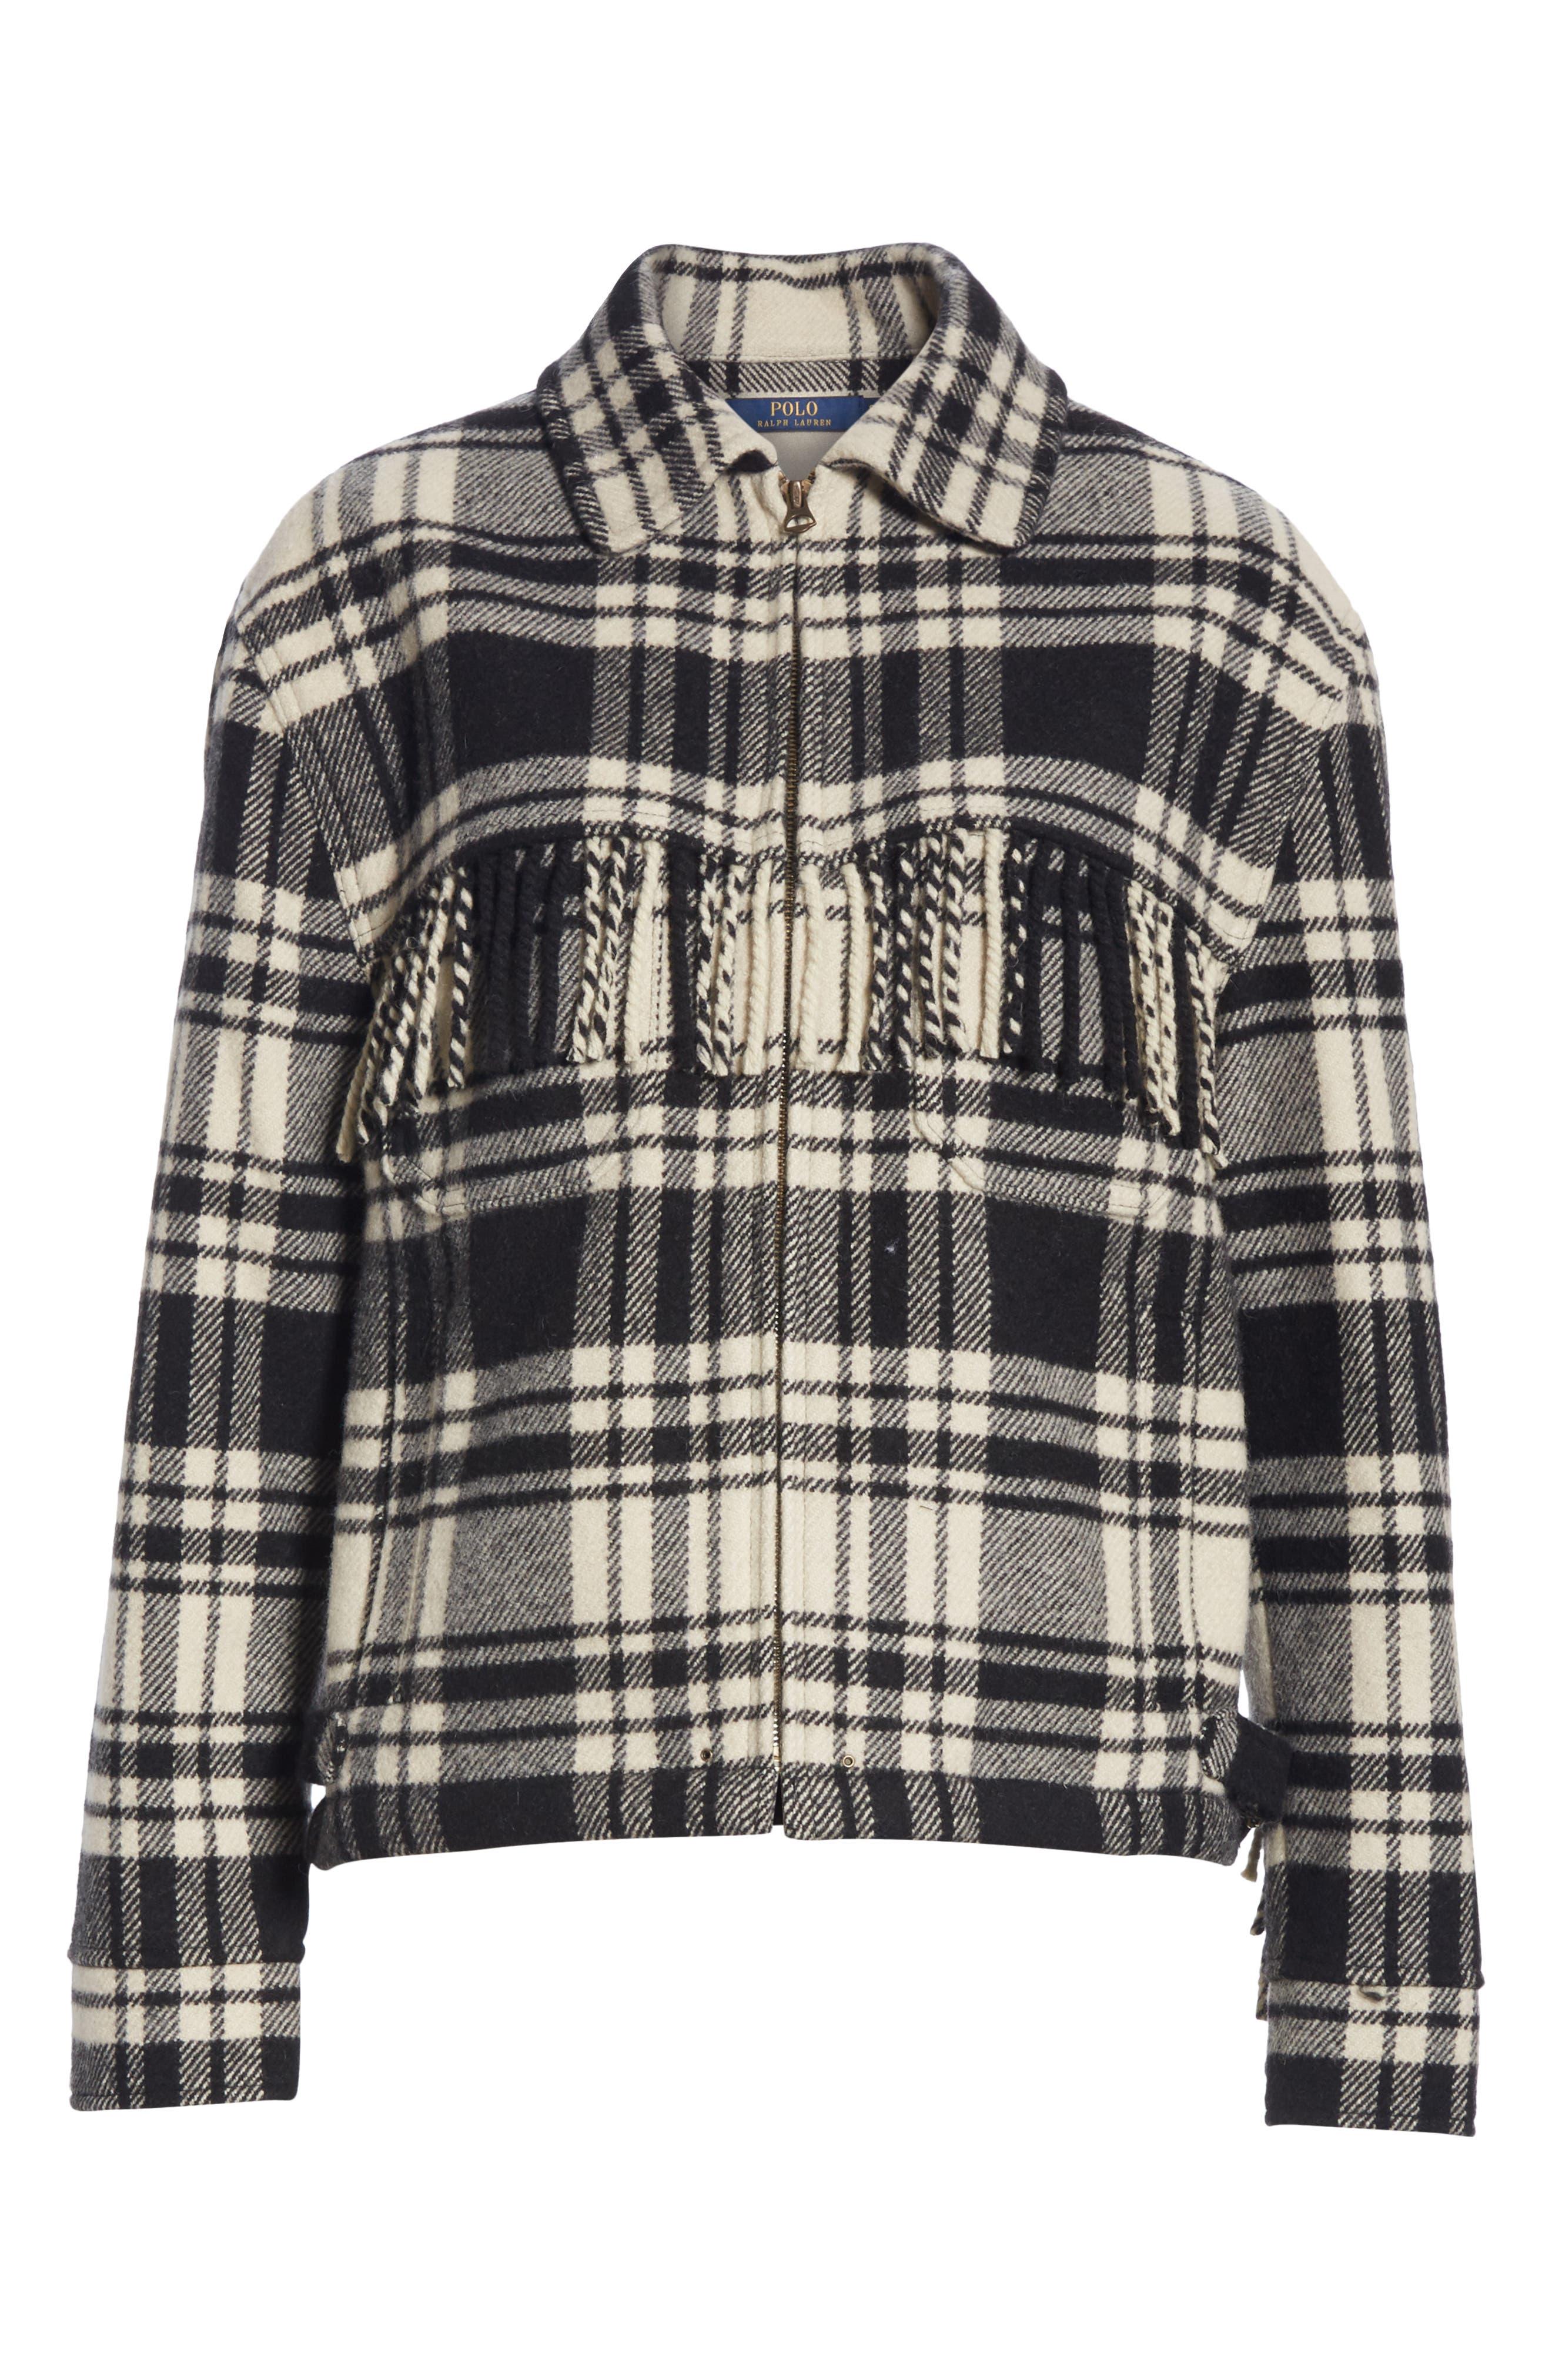 Wool Blend Plaid Jacket,                             Alternate thumbnail 5, color,                             BLACK/ CREAM